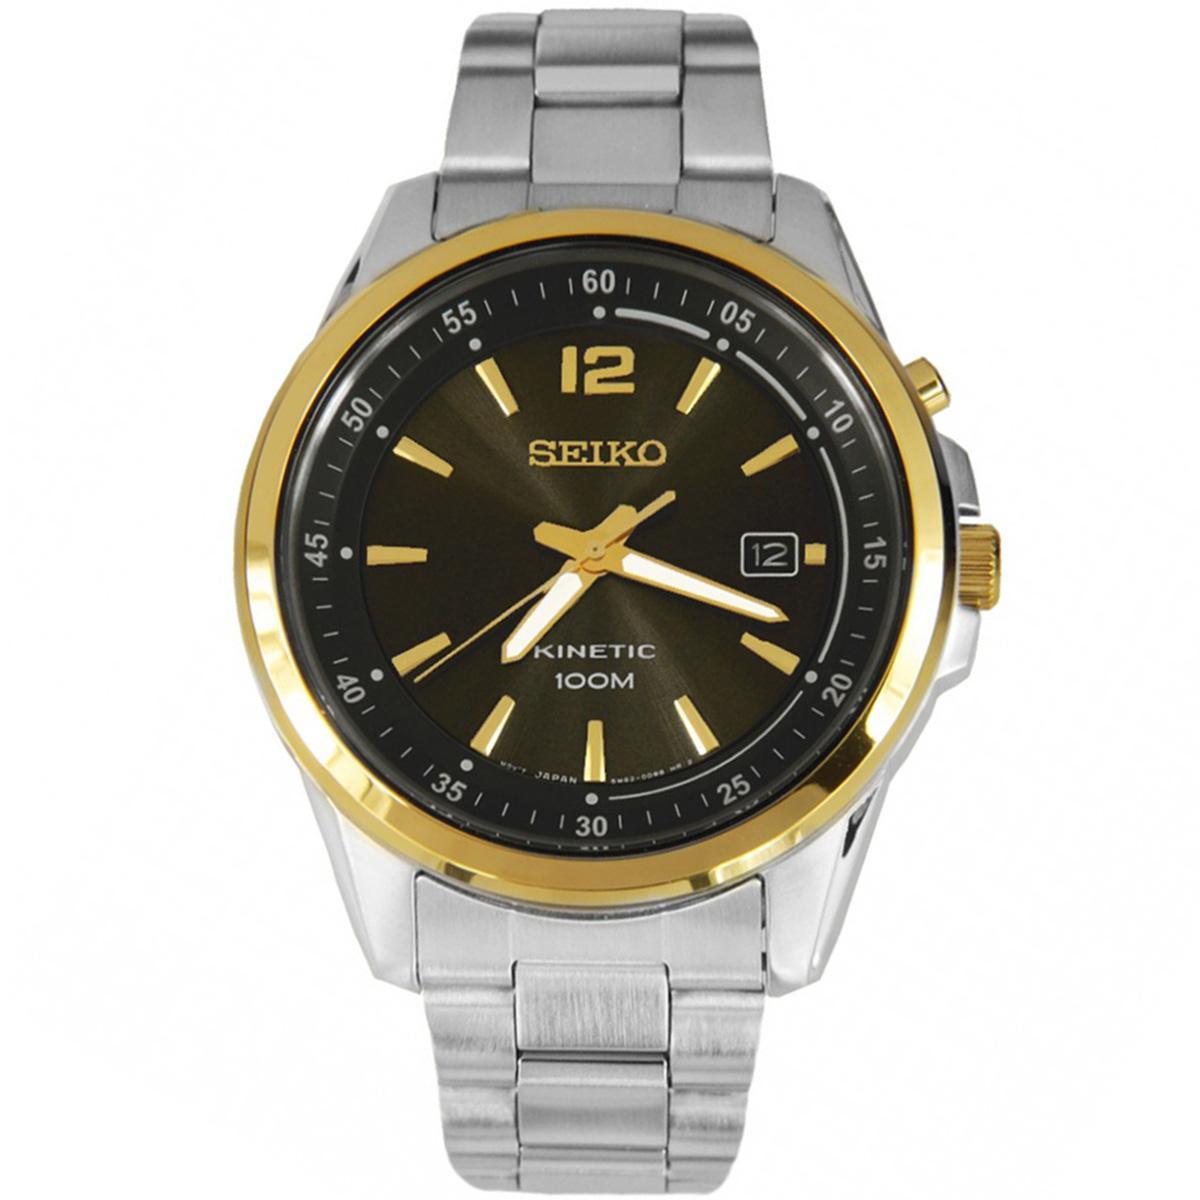 Sell Seiko Kinetic Ska271p1 Cheapest Best Quality Th Store Ska683p1 Silver Dial Stainless Steel Bracelet Case Mens Ska593p1thb4570 Thb 4570